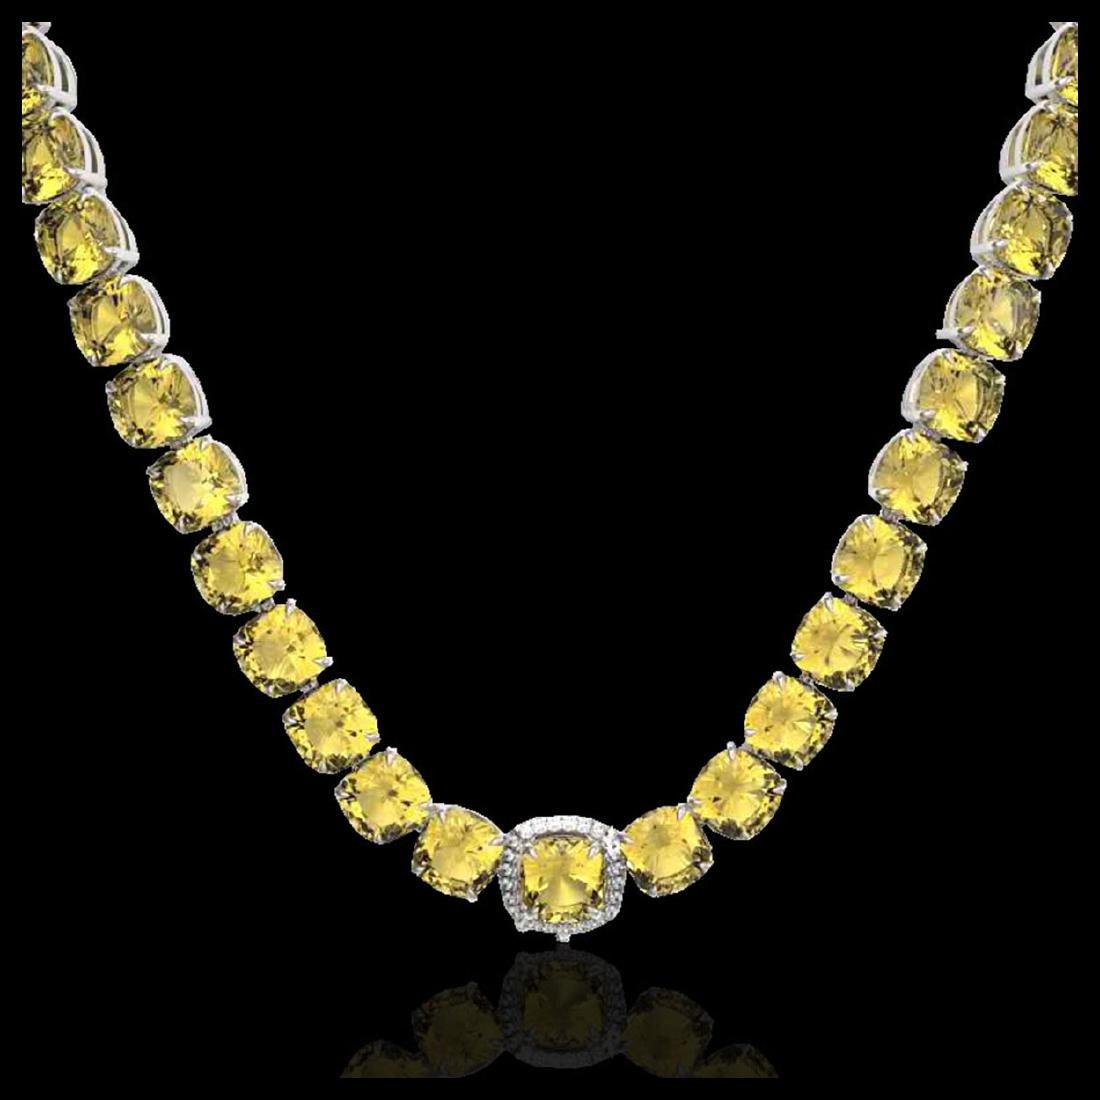 87 ctw Citrine & Diamond Necklace 14K White Gold - - 2